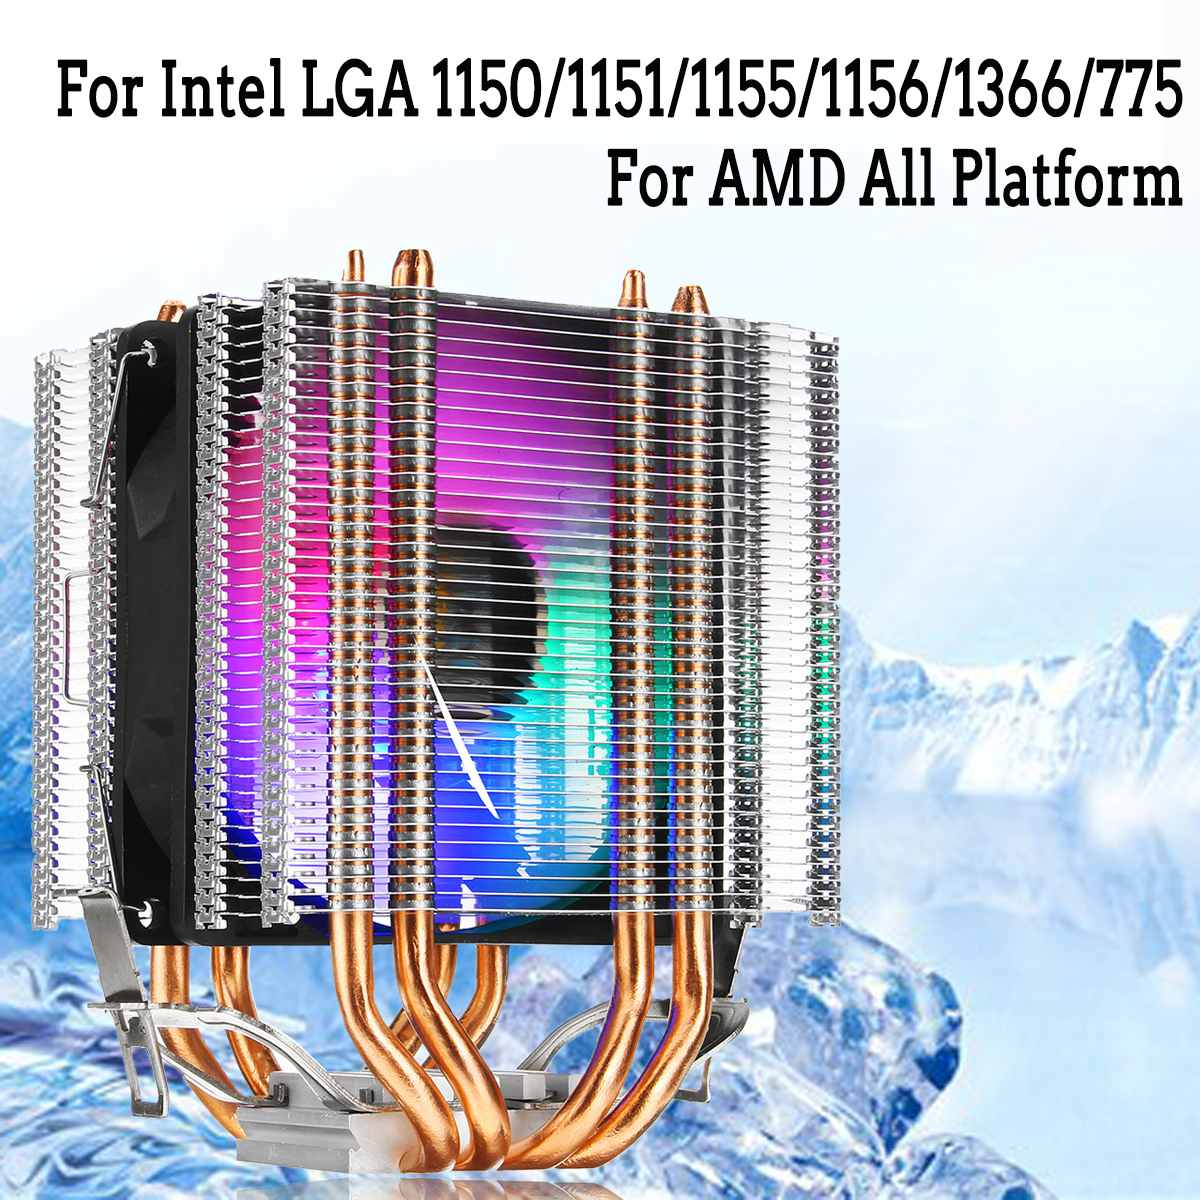 4pin LED CPU Cooler Fan 4 Heatpipe Dual Tower 12V Cooler Cooling Fan Heat Sink for Intel LAG 1155 1156 775 AMD Socket AM3/AM2